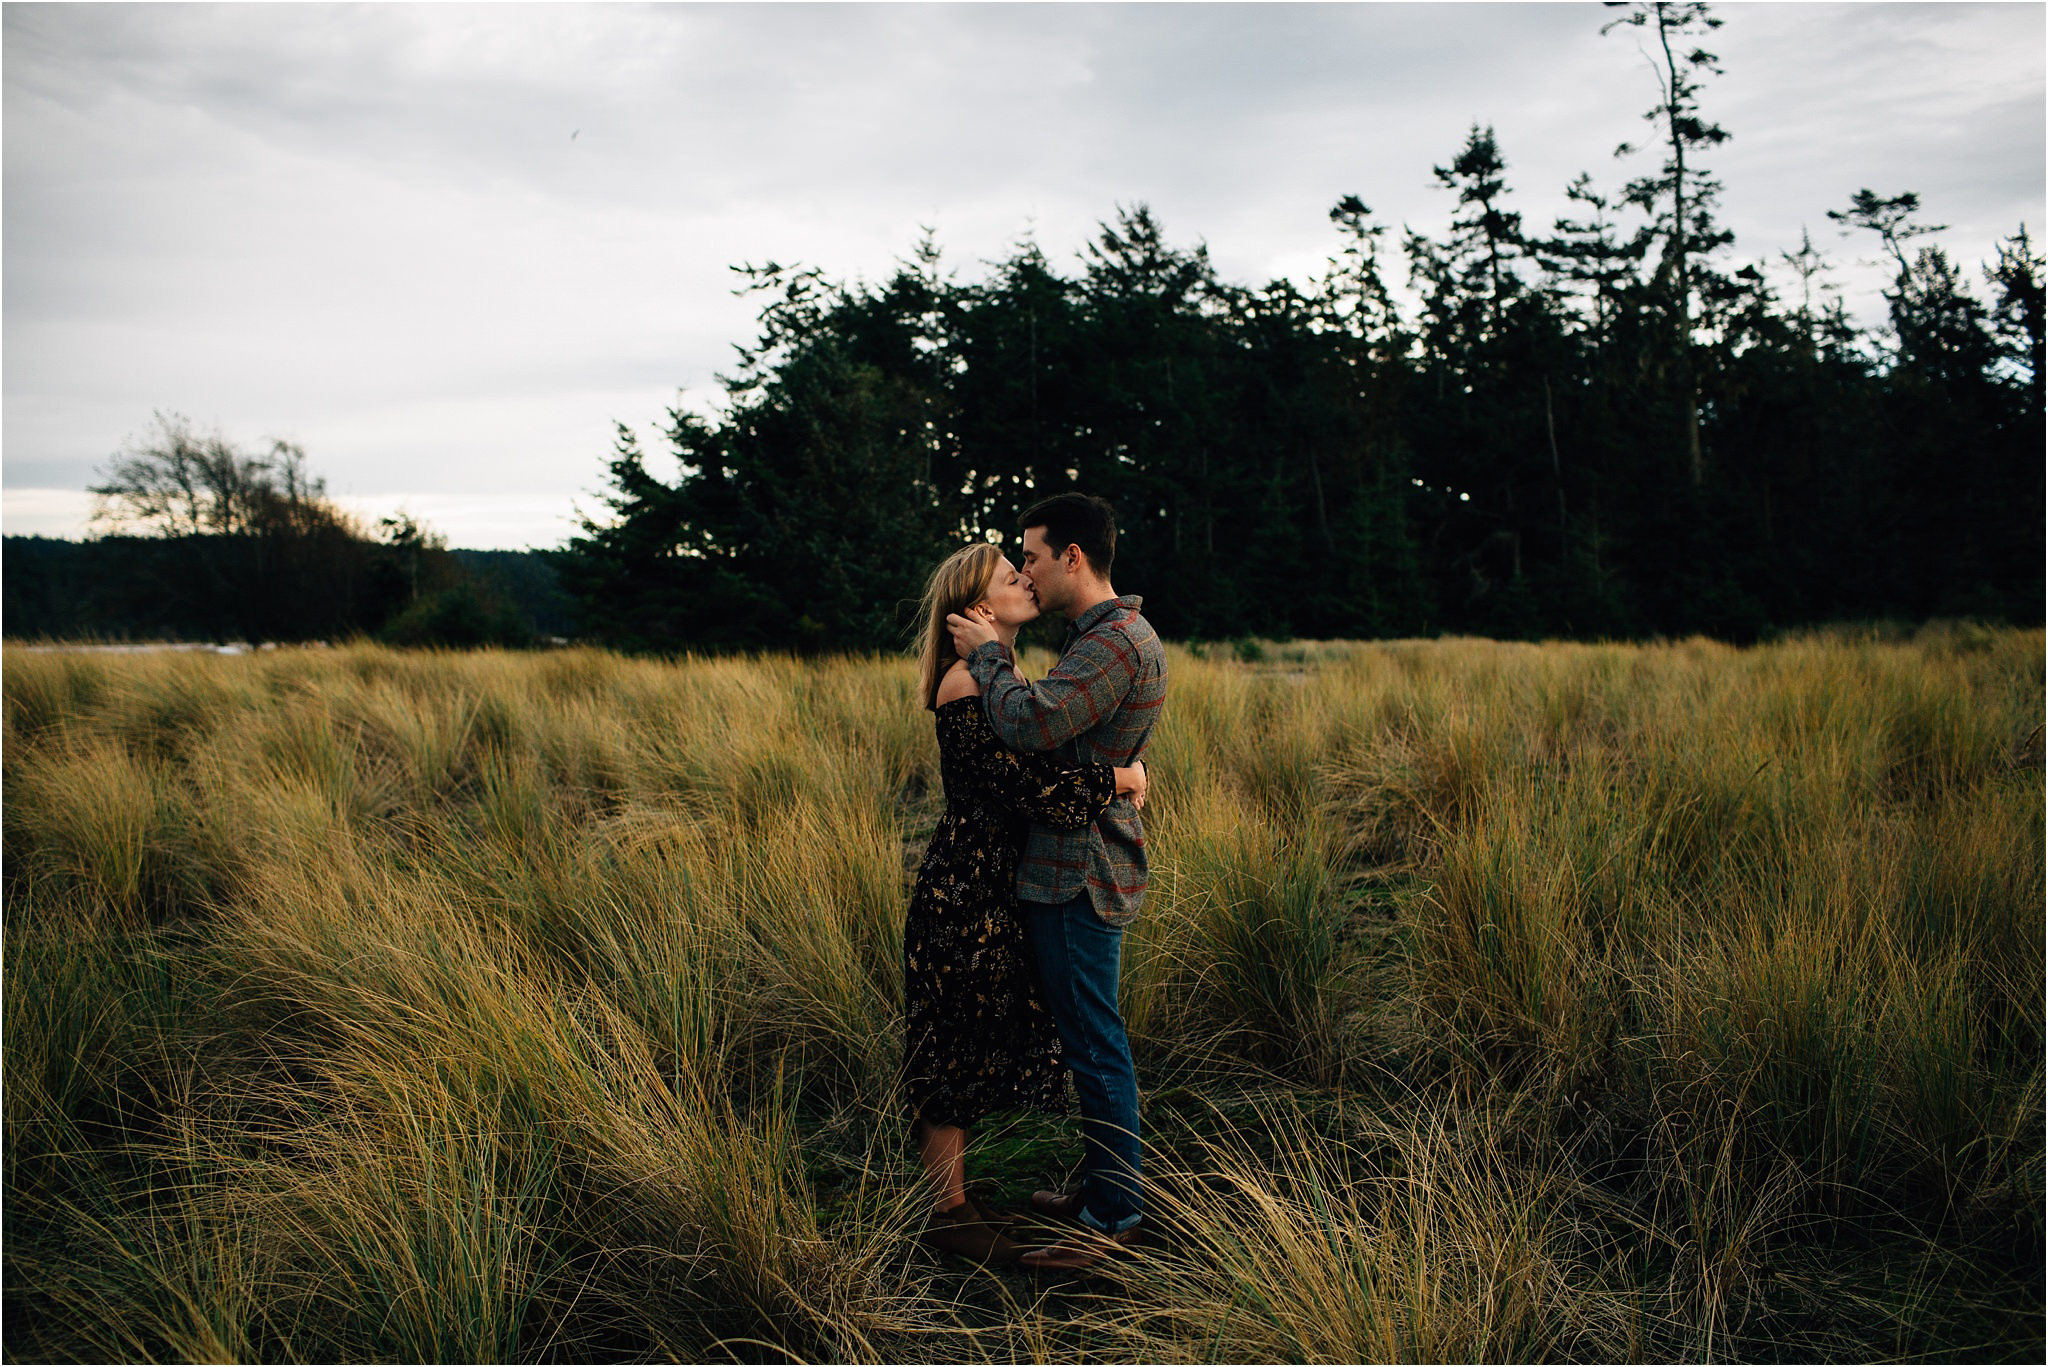 oak-harbor-couples-photographer-deception-pass-5.jpg